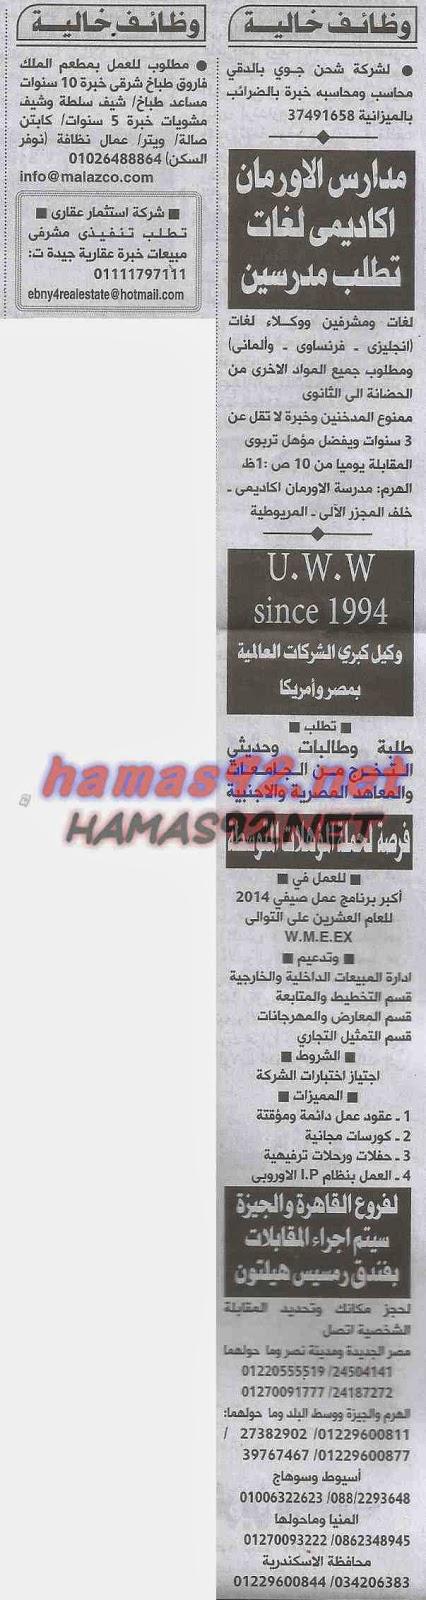 3a7a7e3e9 اعلانات وظائف جريدة الاهرام المصرية اليوم الثلاثاء 24 يونيو 2014 ...